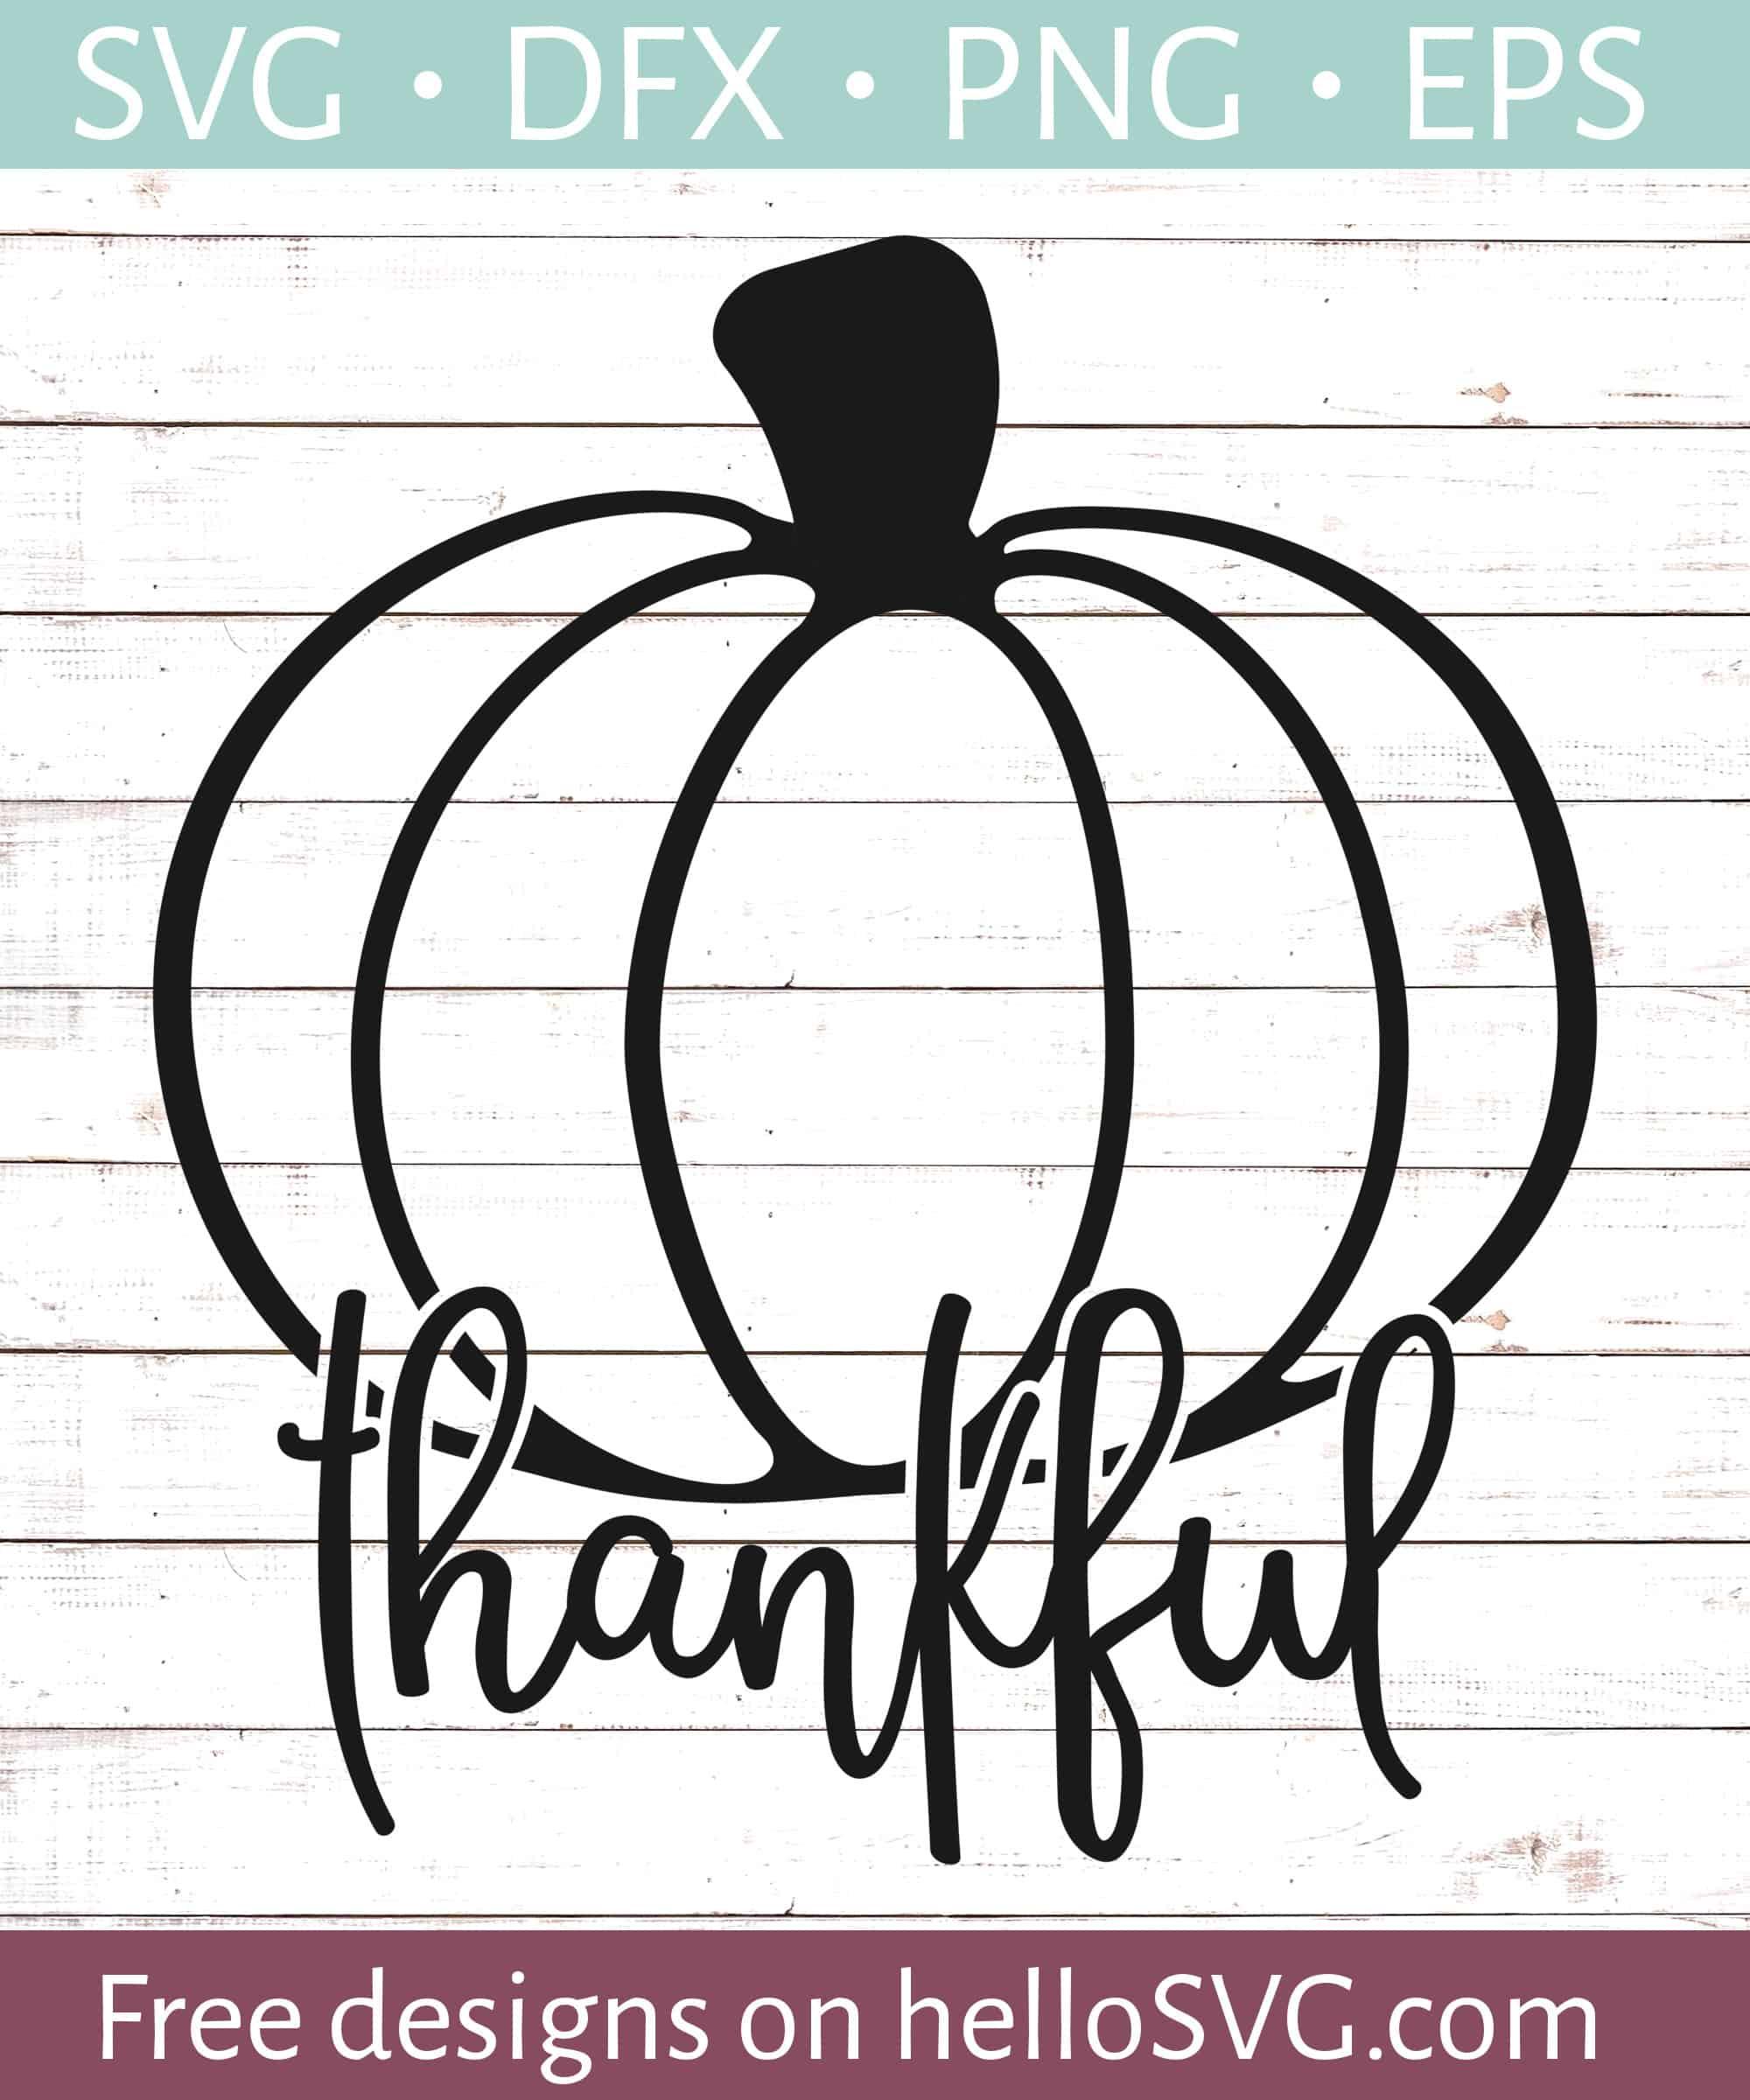 Thankful Svg : thankful, Thankful, Pumpkin, Files, HelloSVG.com